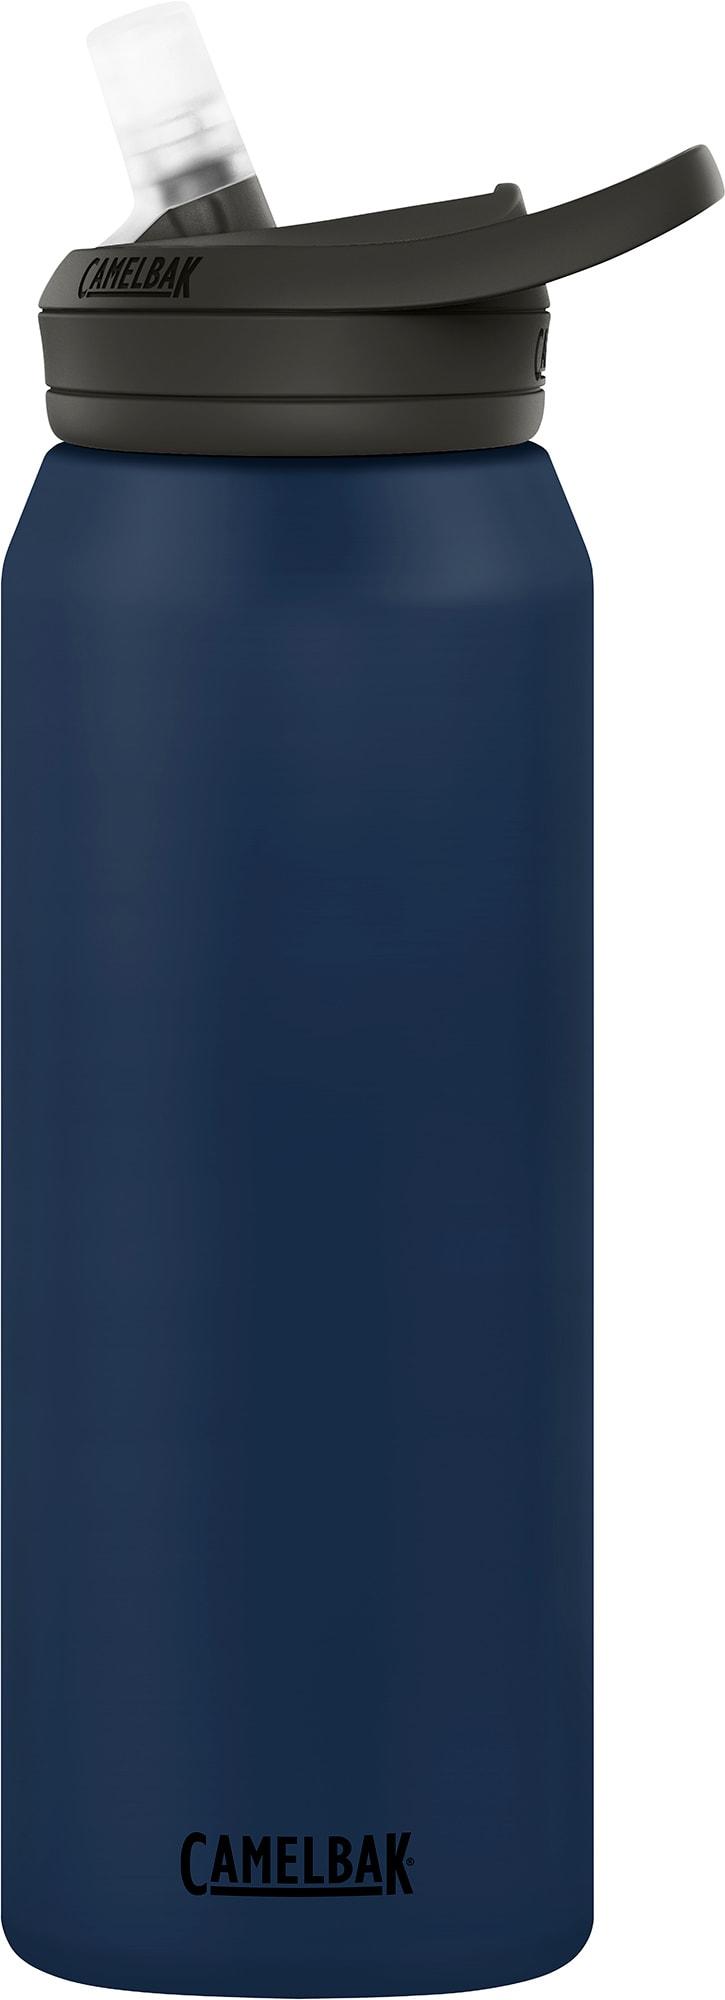 Camelbak Eddy+ 1 L Insulated Stainless SteelNavy